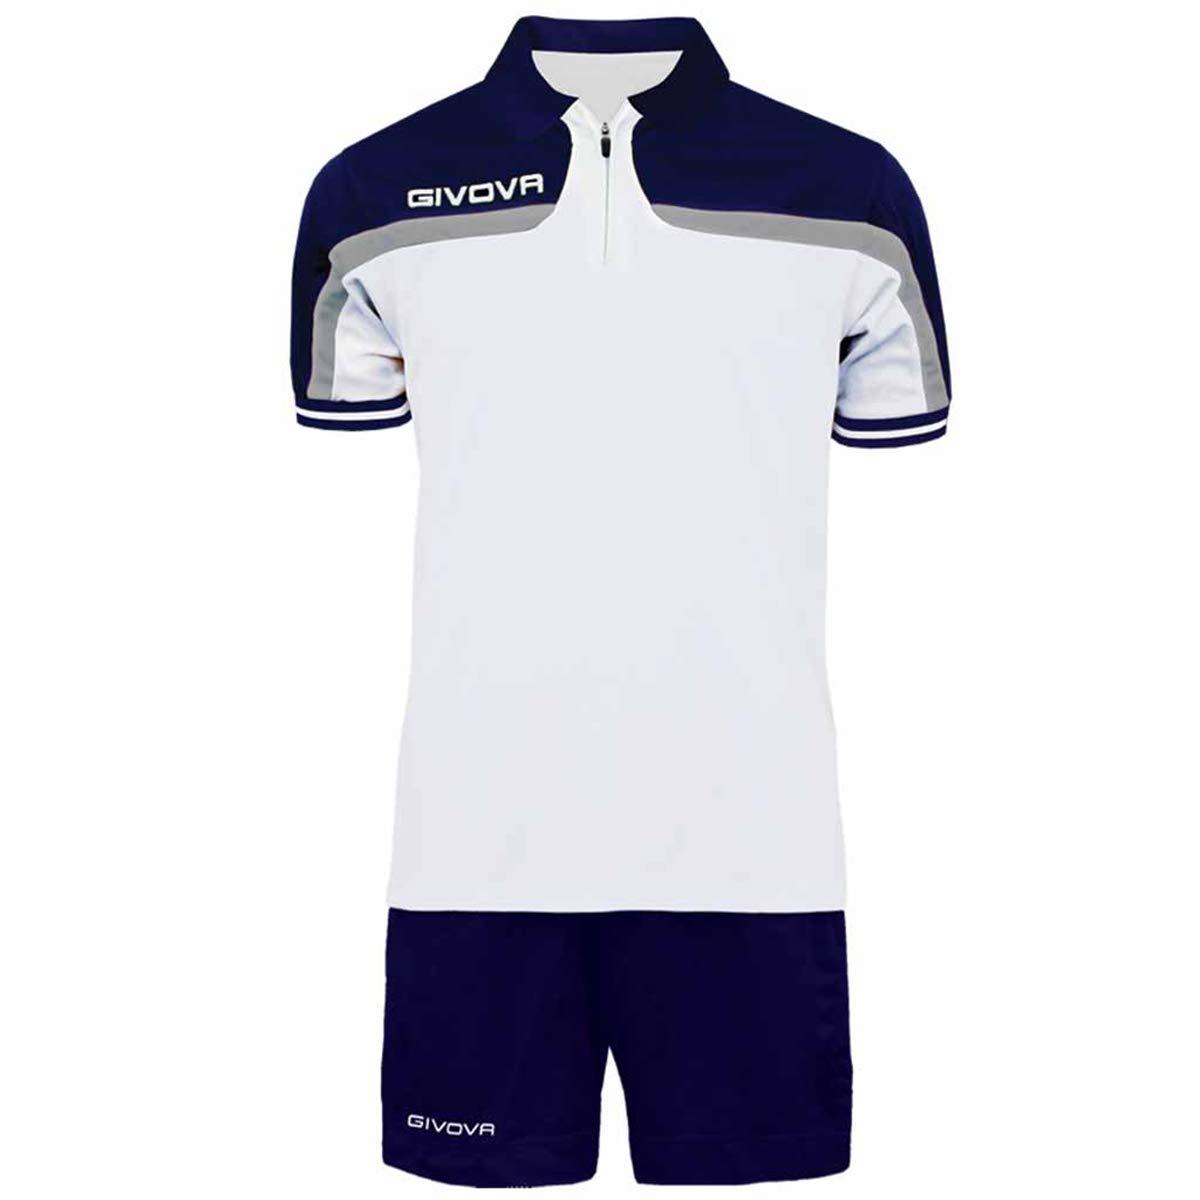 Giosal - Traje Completo Givova Kit Fast Polo, pantalón Corto Azul ...